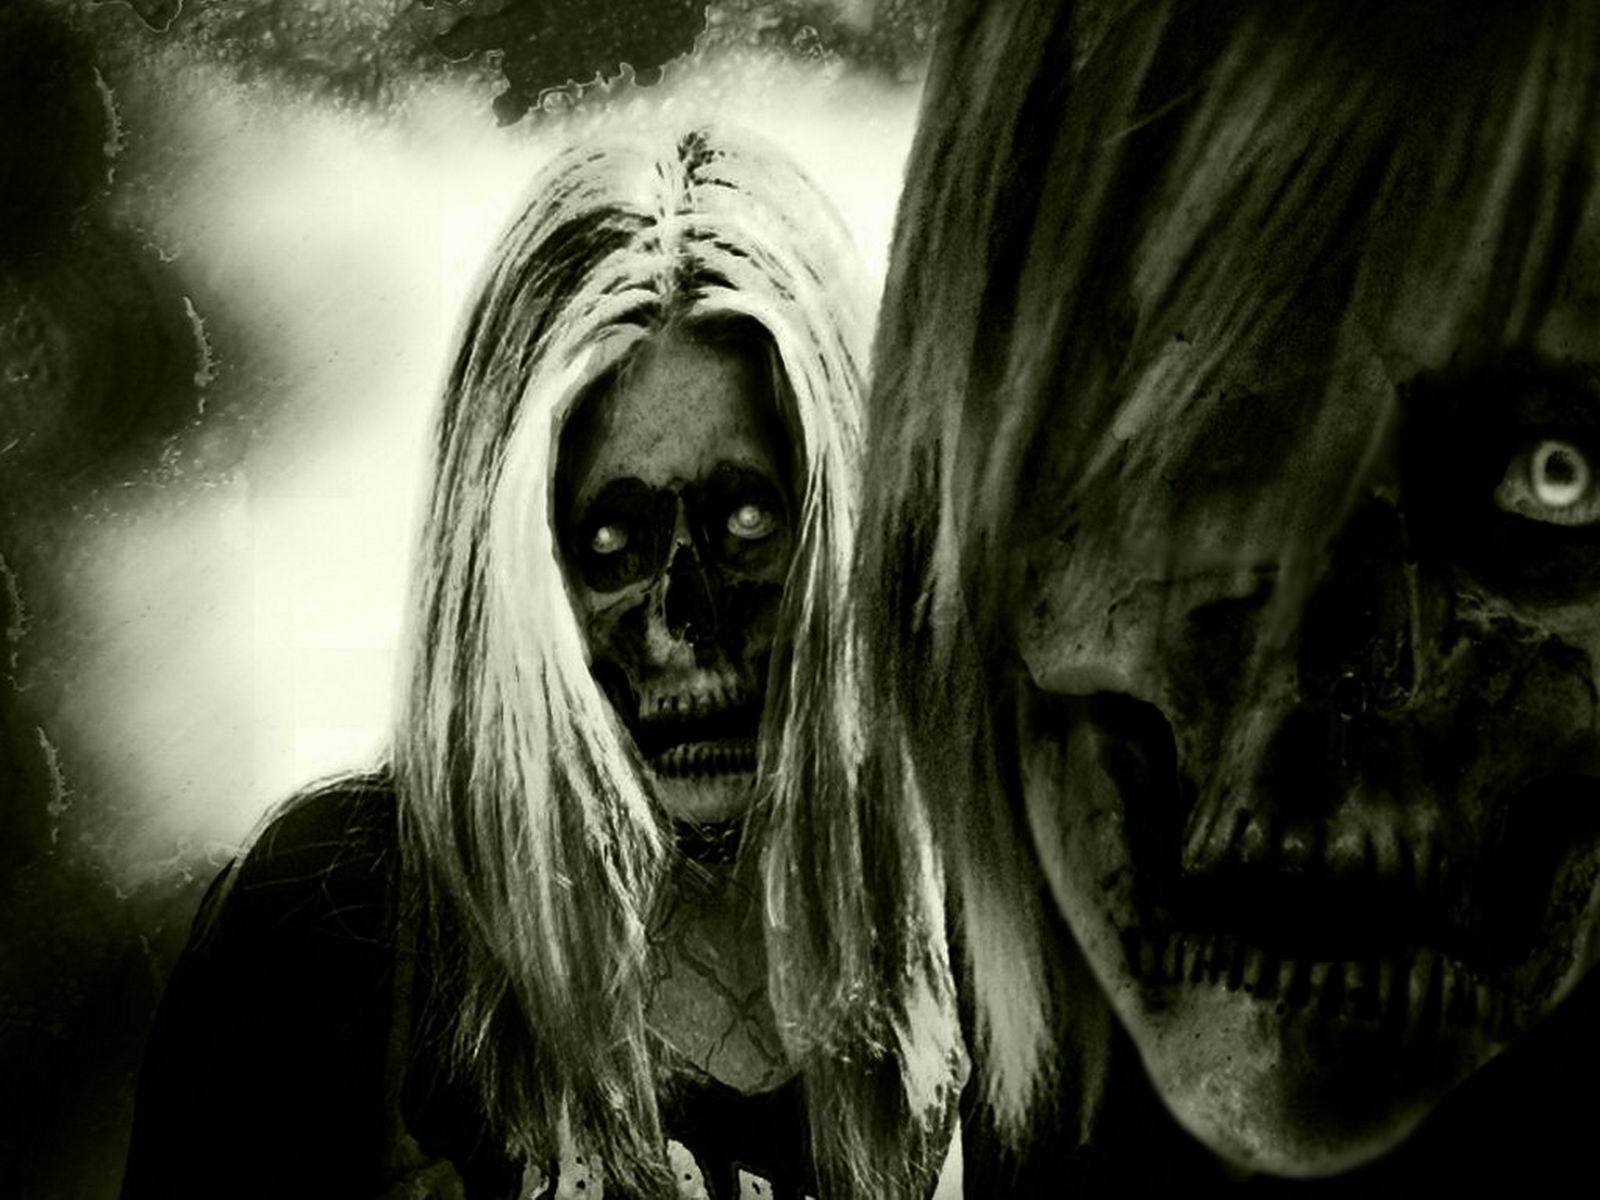 http://4.bp.blogspot.com/-WhYNIoVvCCA/T3hz5b-oTnI/AAAAAAAAAUE/SWbDfBHrurs/s1600/1600-1200-halloween-gallery.jpg